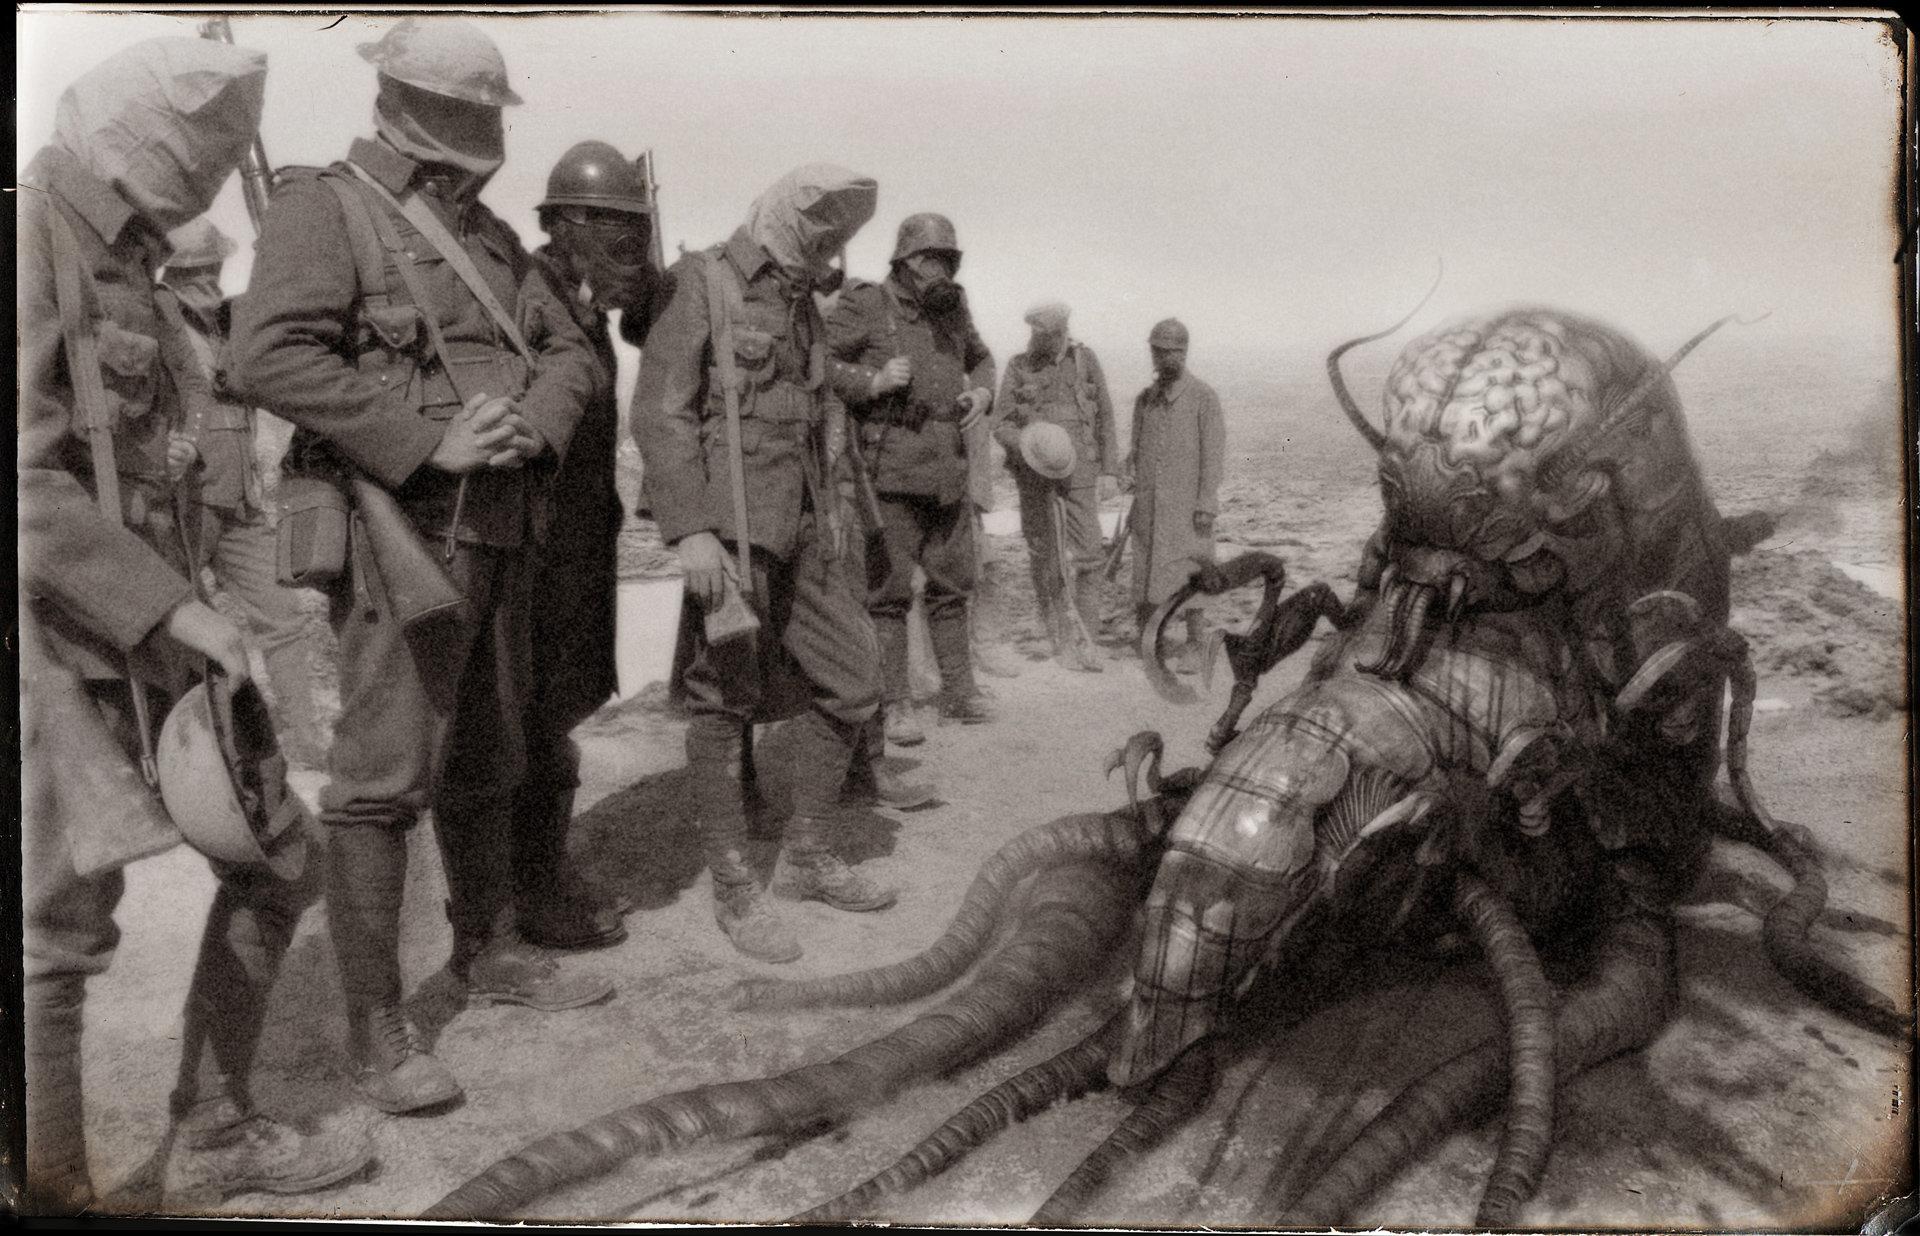 Christian Johnson Great Martian War Old Photographs